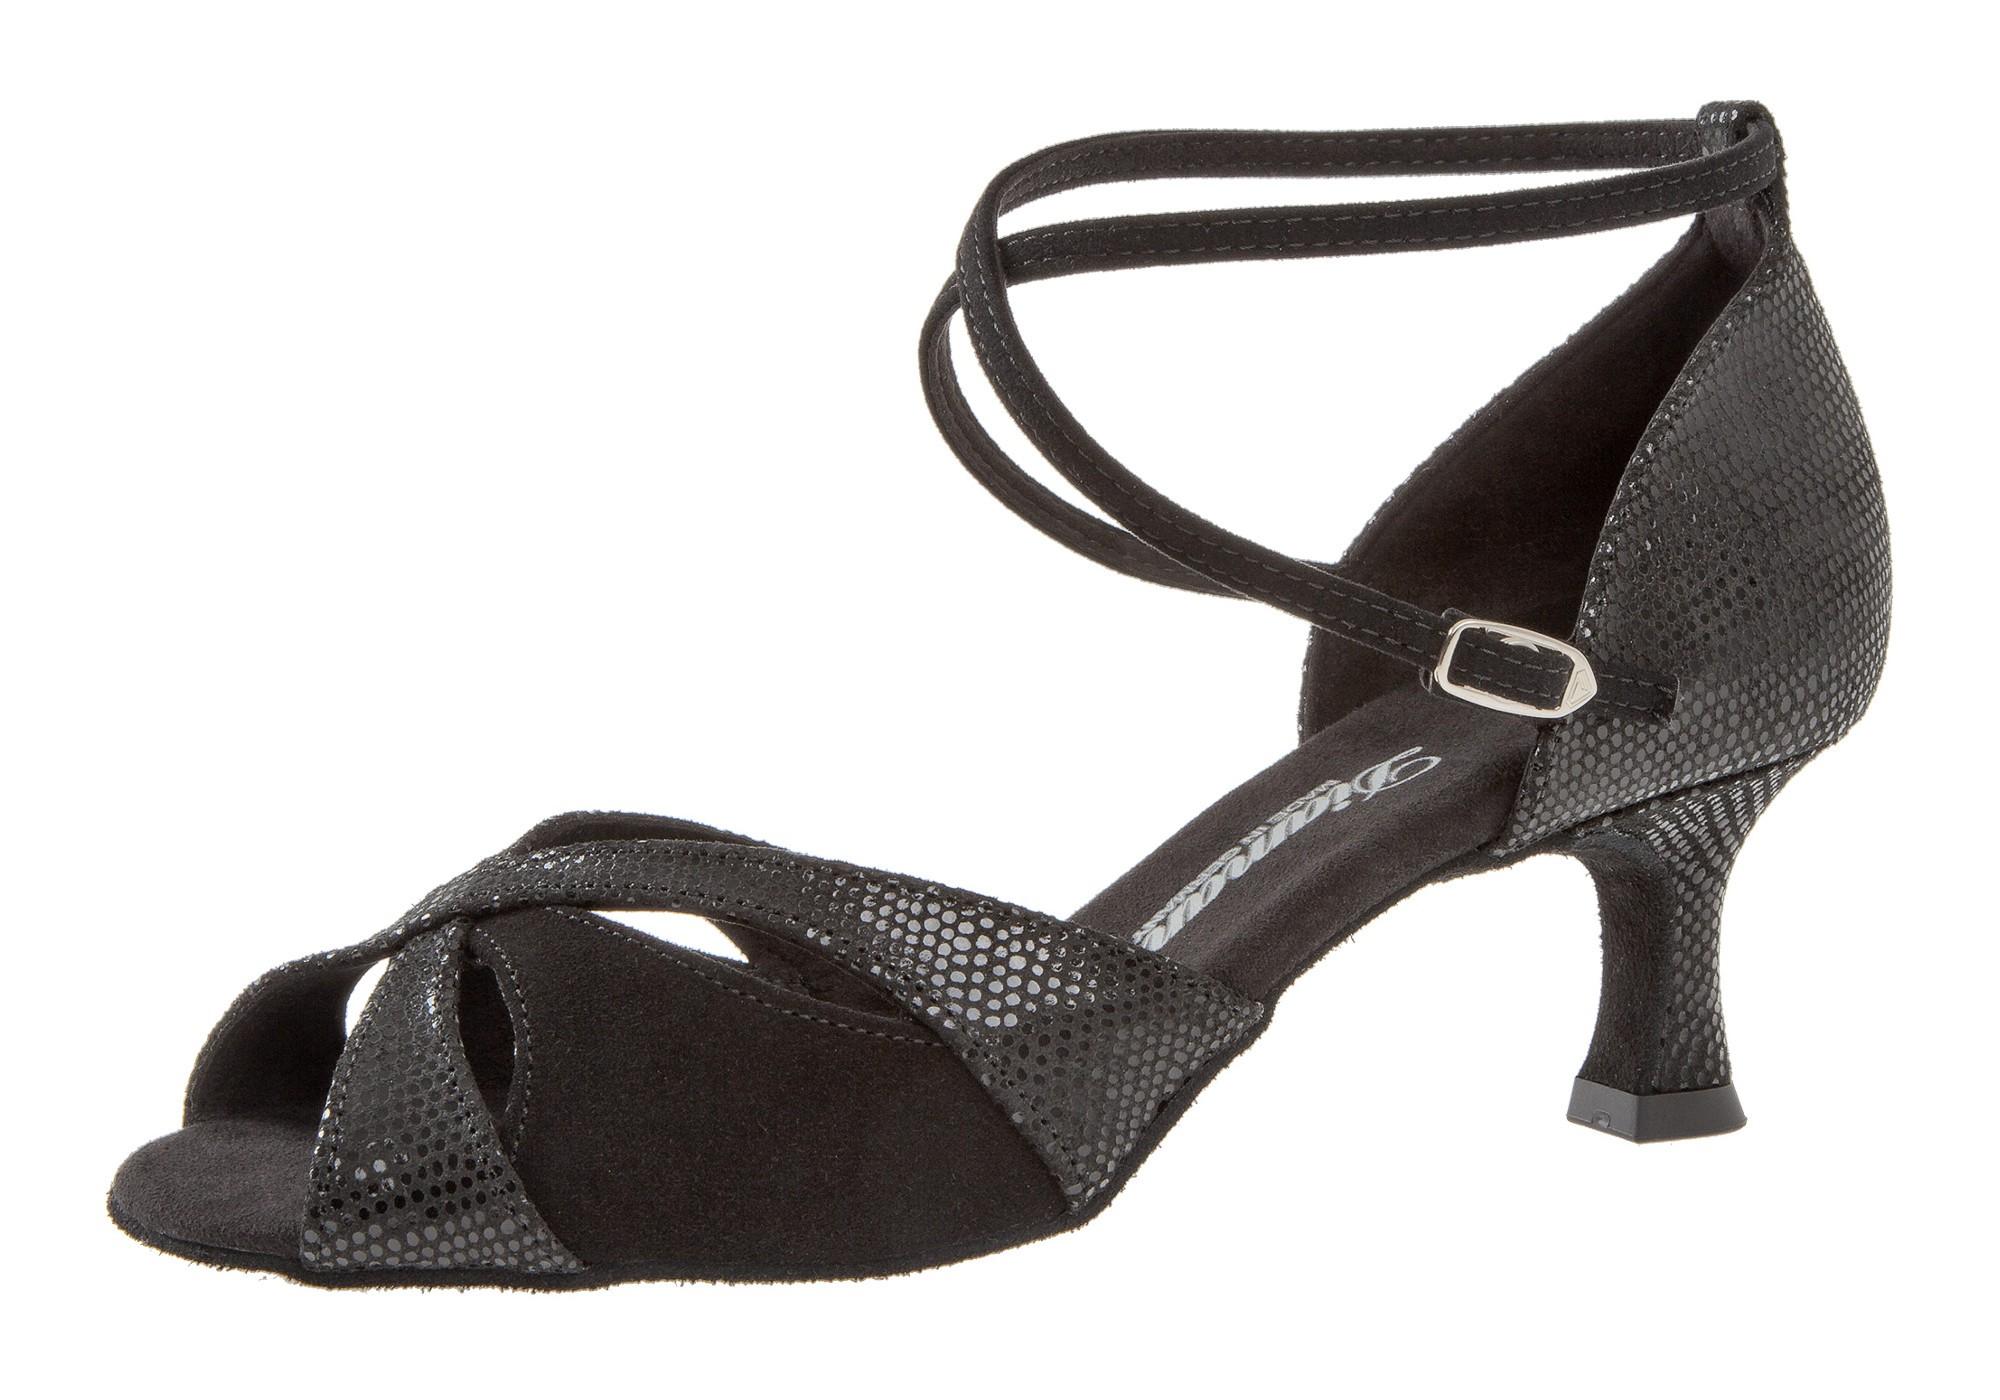 Diamant Damen Tanzschuh Latein 141-077-084 schwarz Velour